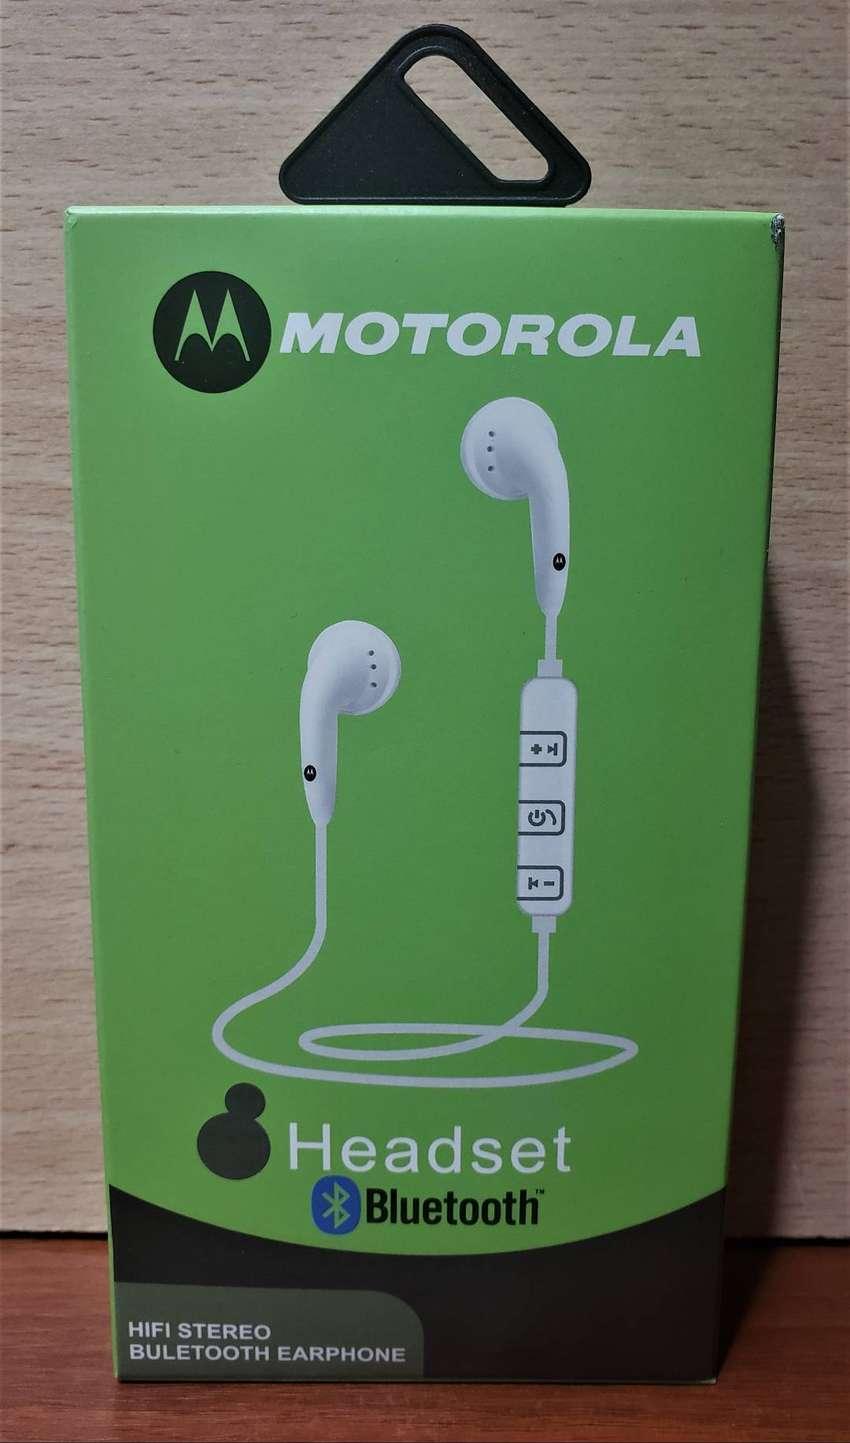 MOTOROLA  Headset Bluetooth Inalambrico  Universal HIFI STEREO